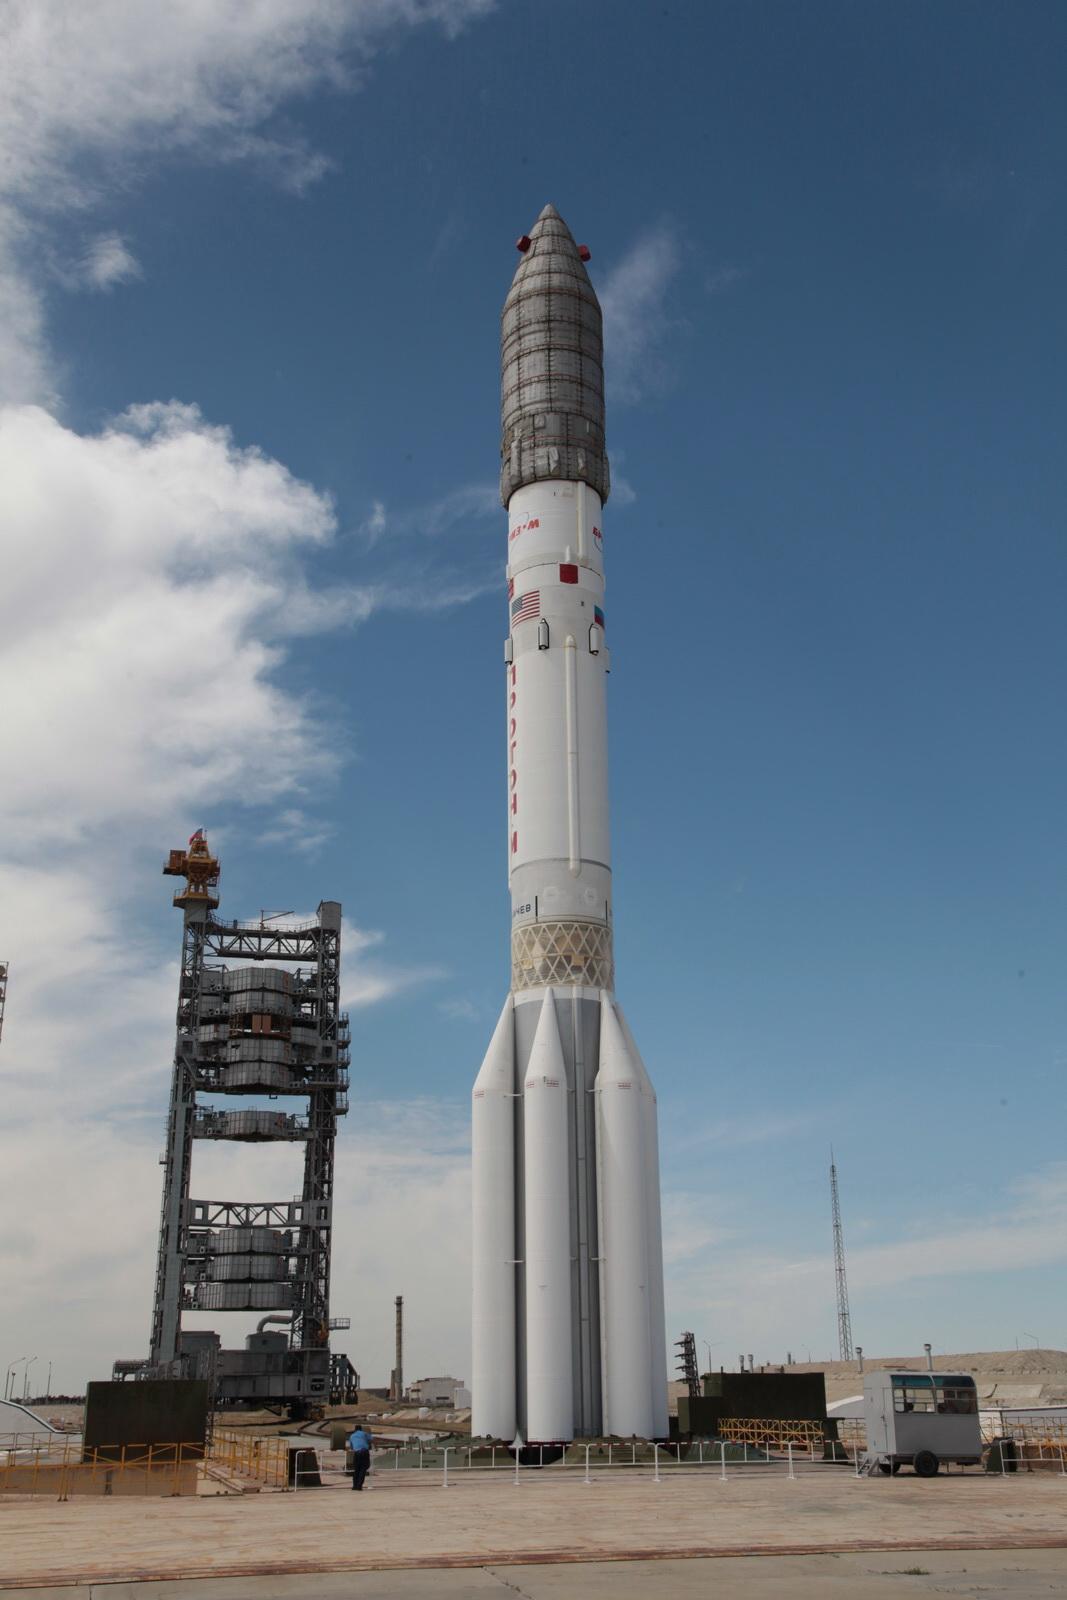 Proton-M Rocket rolls to Baikonur Launch Pad for long Satellite